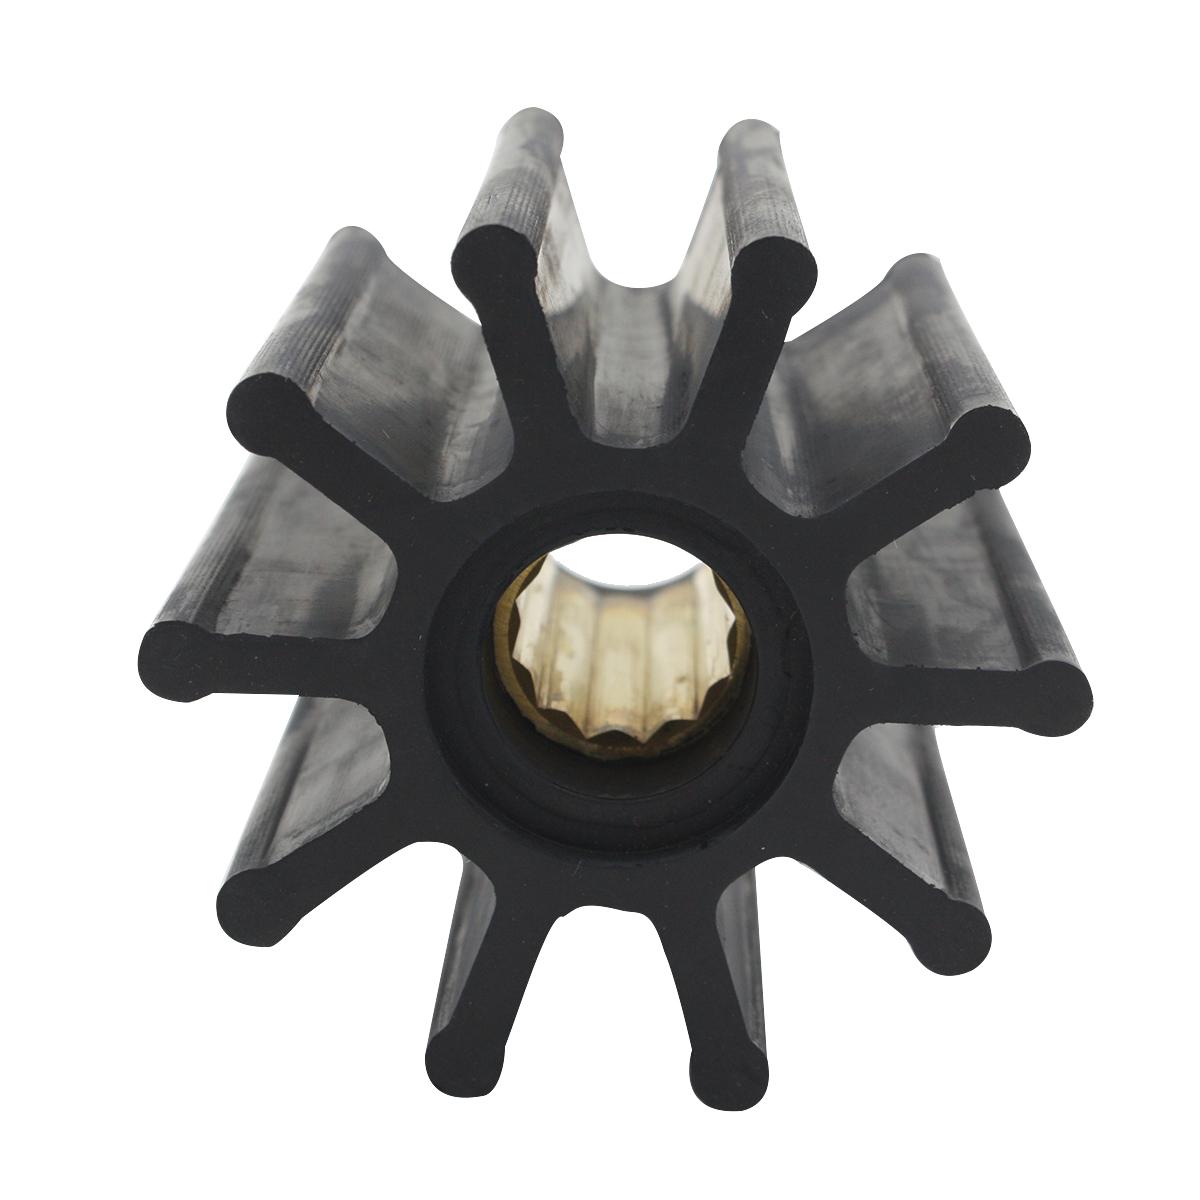 Impeller Replacement for Yanmar 119593-42200 119593-42202 Mercruiser 47-809866T